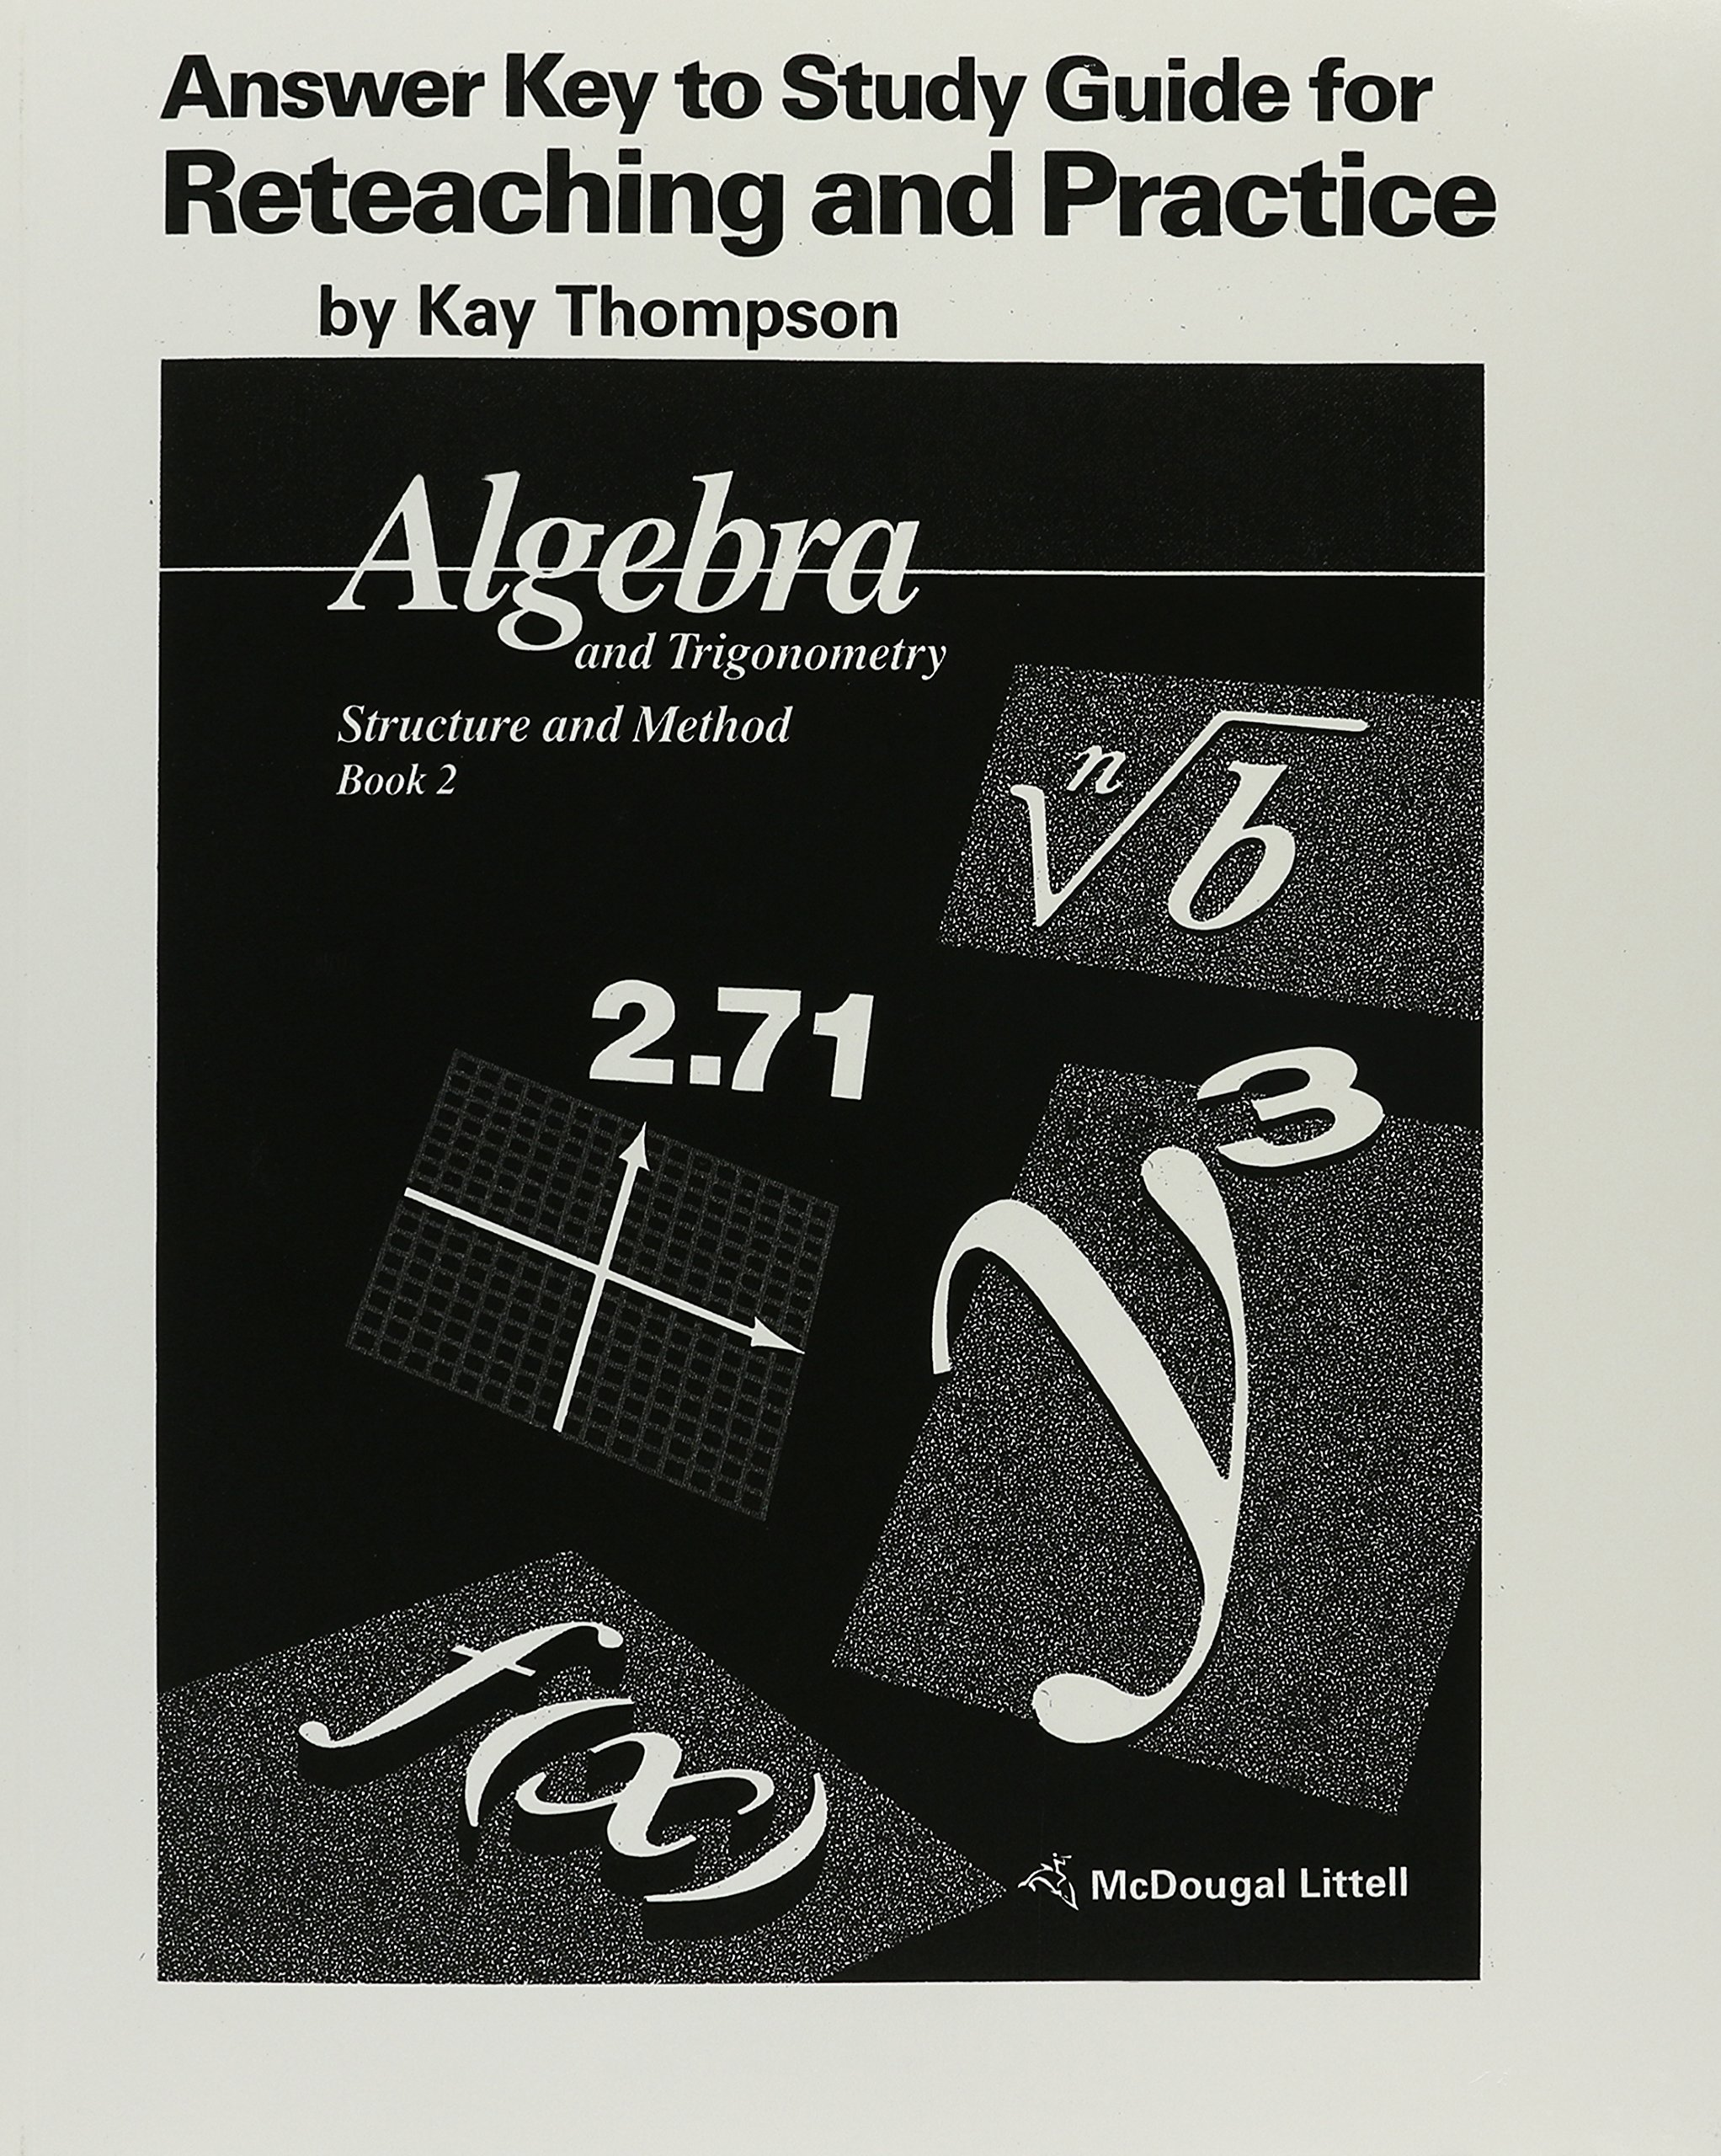 Algebra and trigonometry structure and method answer key to study algebra and trigonometry structure and method answer key to study guide for reteaching and practice kay thompson 9780395470657 amazon books fandeluxe Choice Image